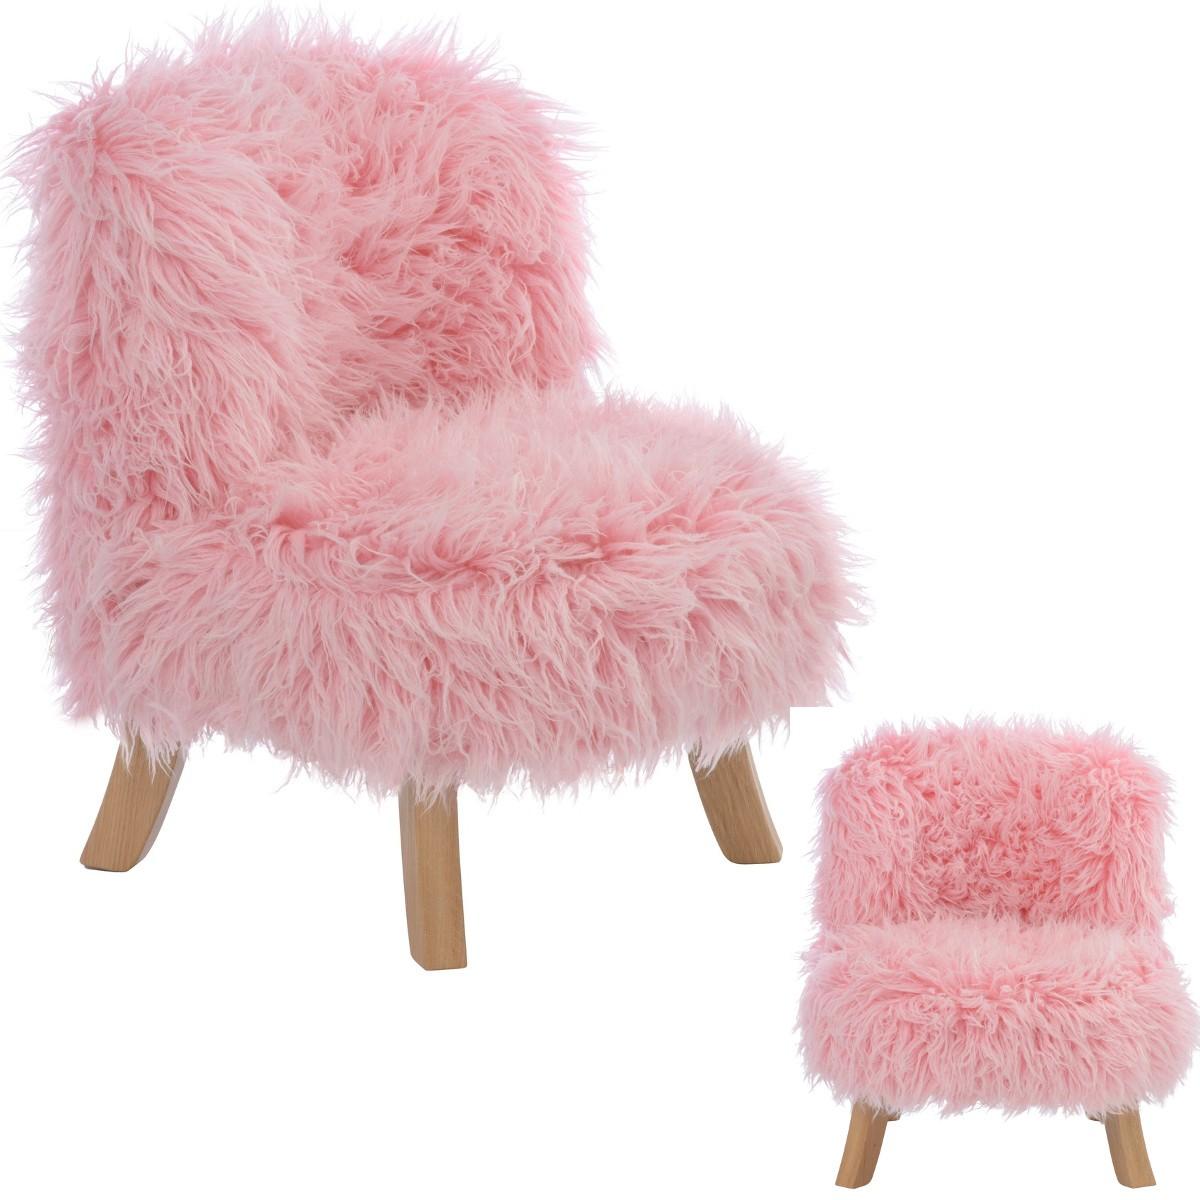 Kindersessel design  Somebunny Design Luxus Kindersessel Fake-Fur, 100% handgemacht ...